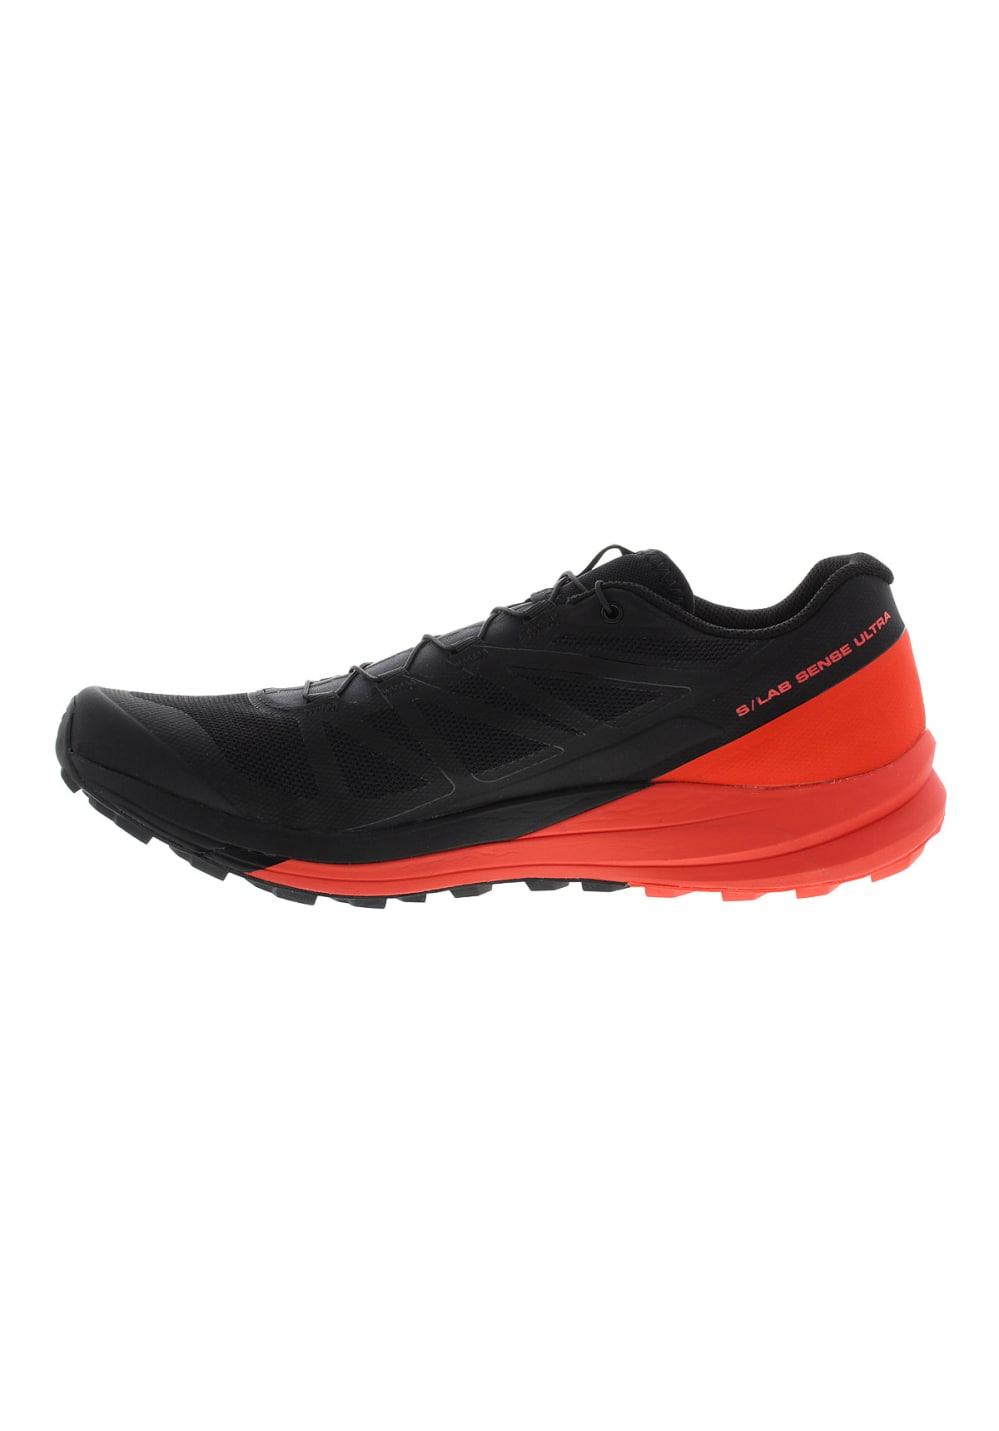 outlet store 2ecc9 90003 Salomon S-Lab Sense Ultra - Running shoes - White